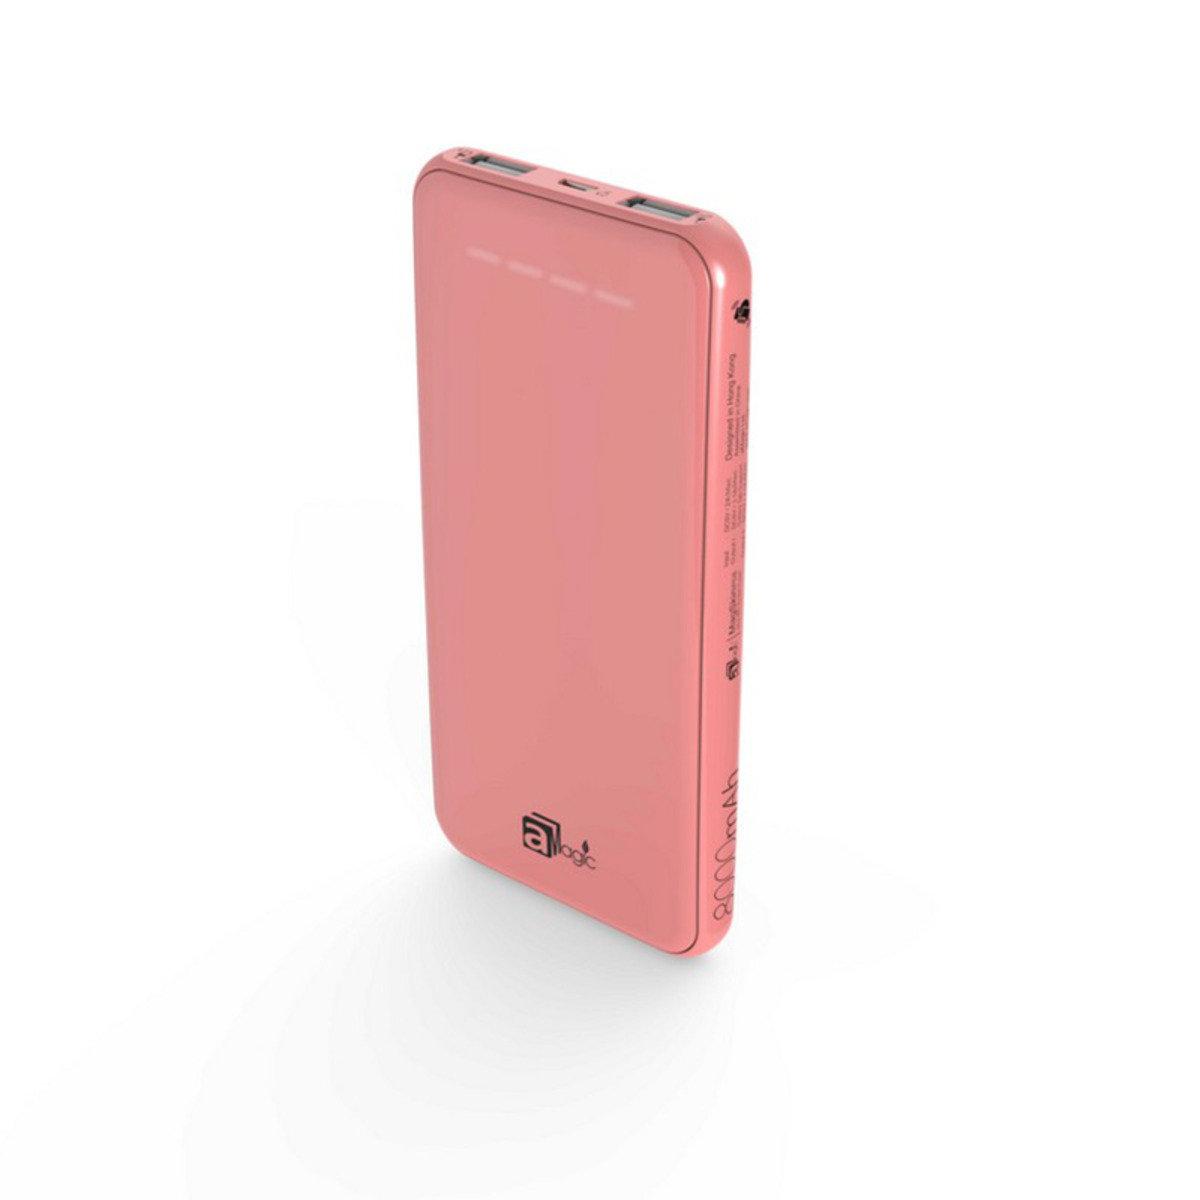 MagSkin - P08 8000mAh 纖薄型高容量行動電源(粉紅色) (APB-5280)